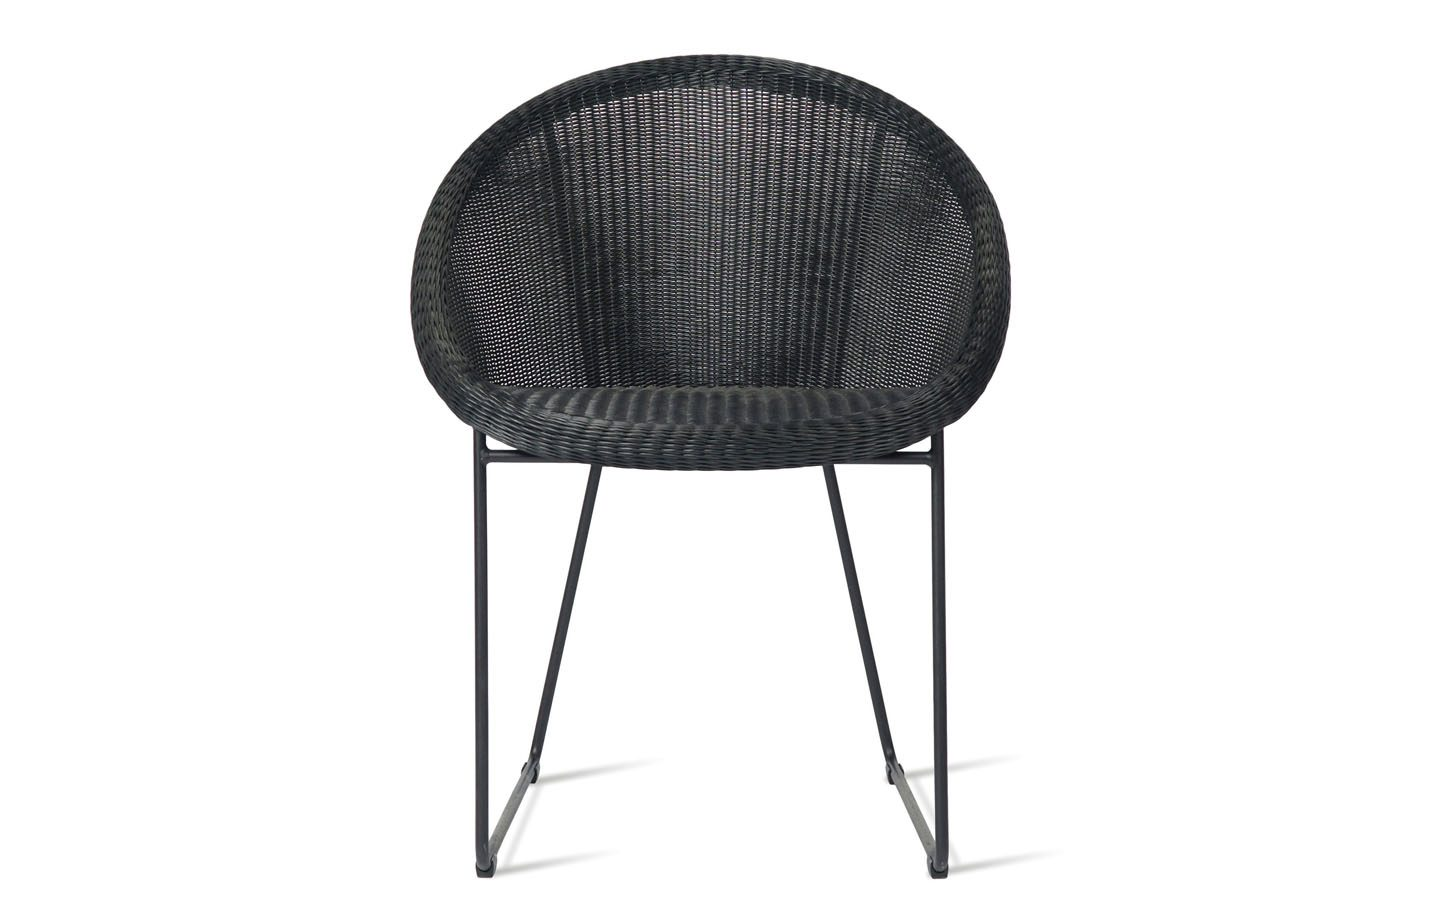 Gipsy-dining-chair-black-base-02